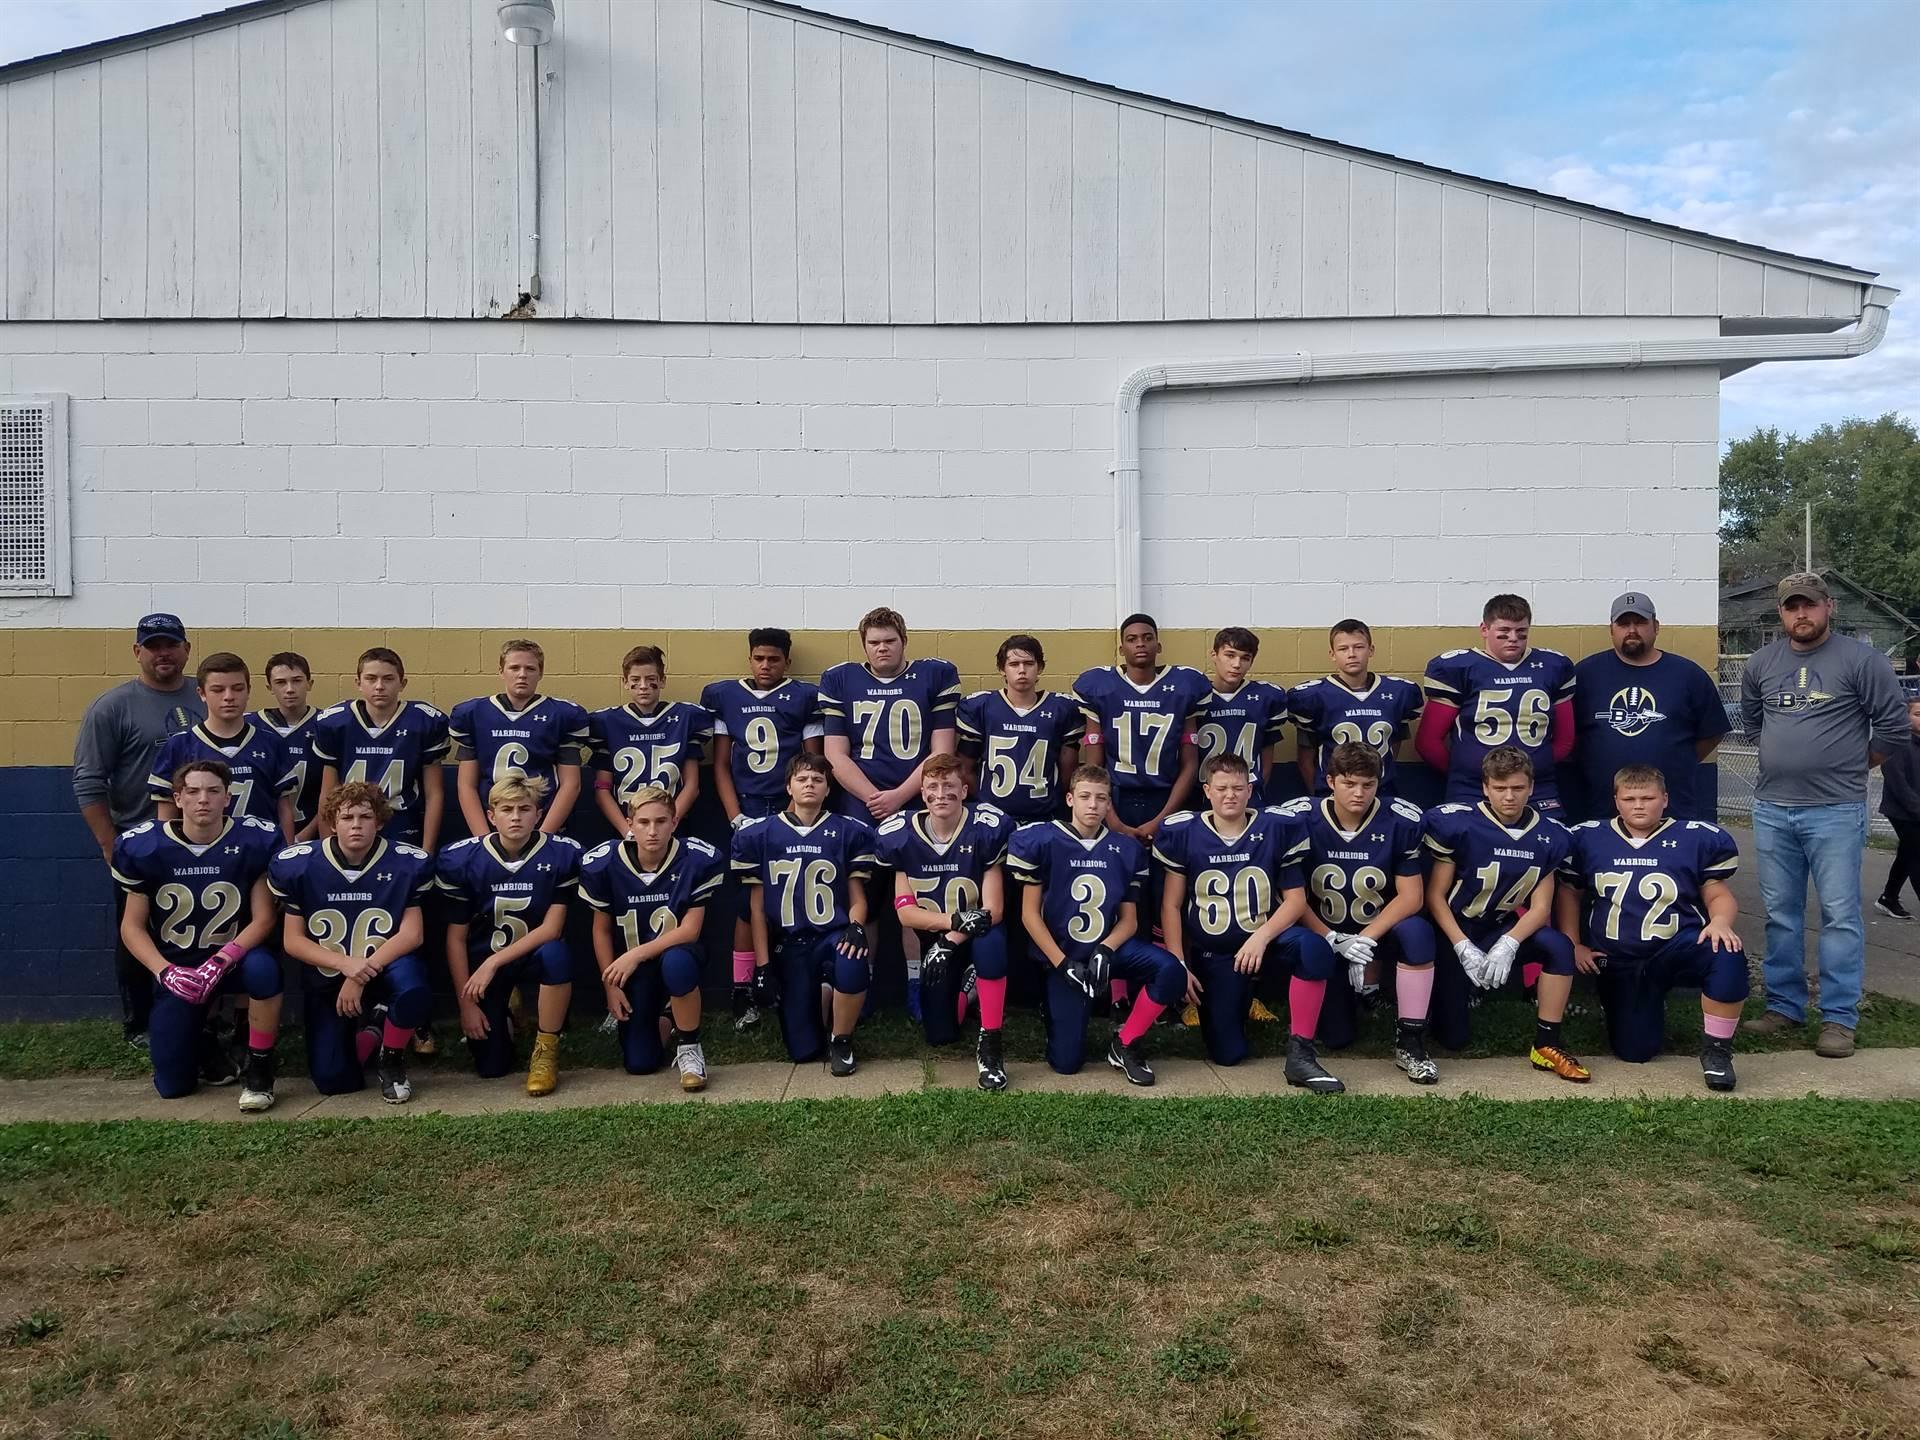 2017 middle school football team